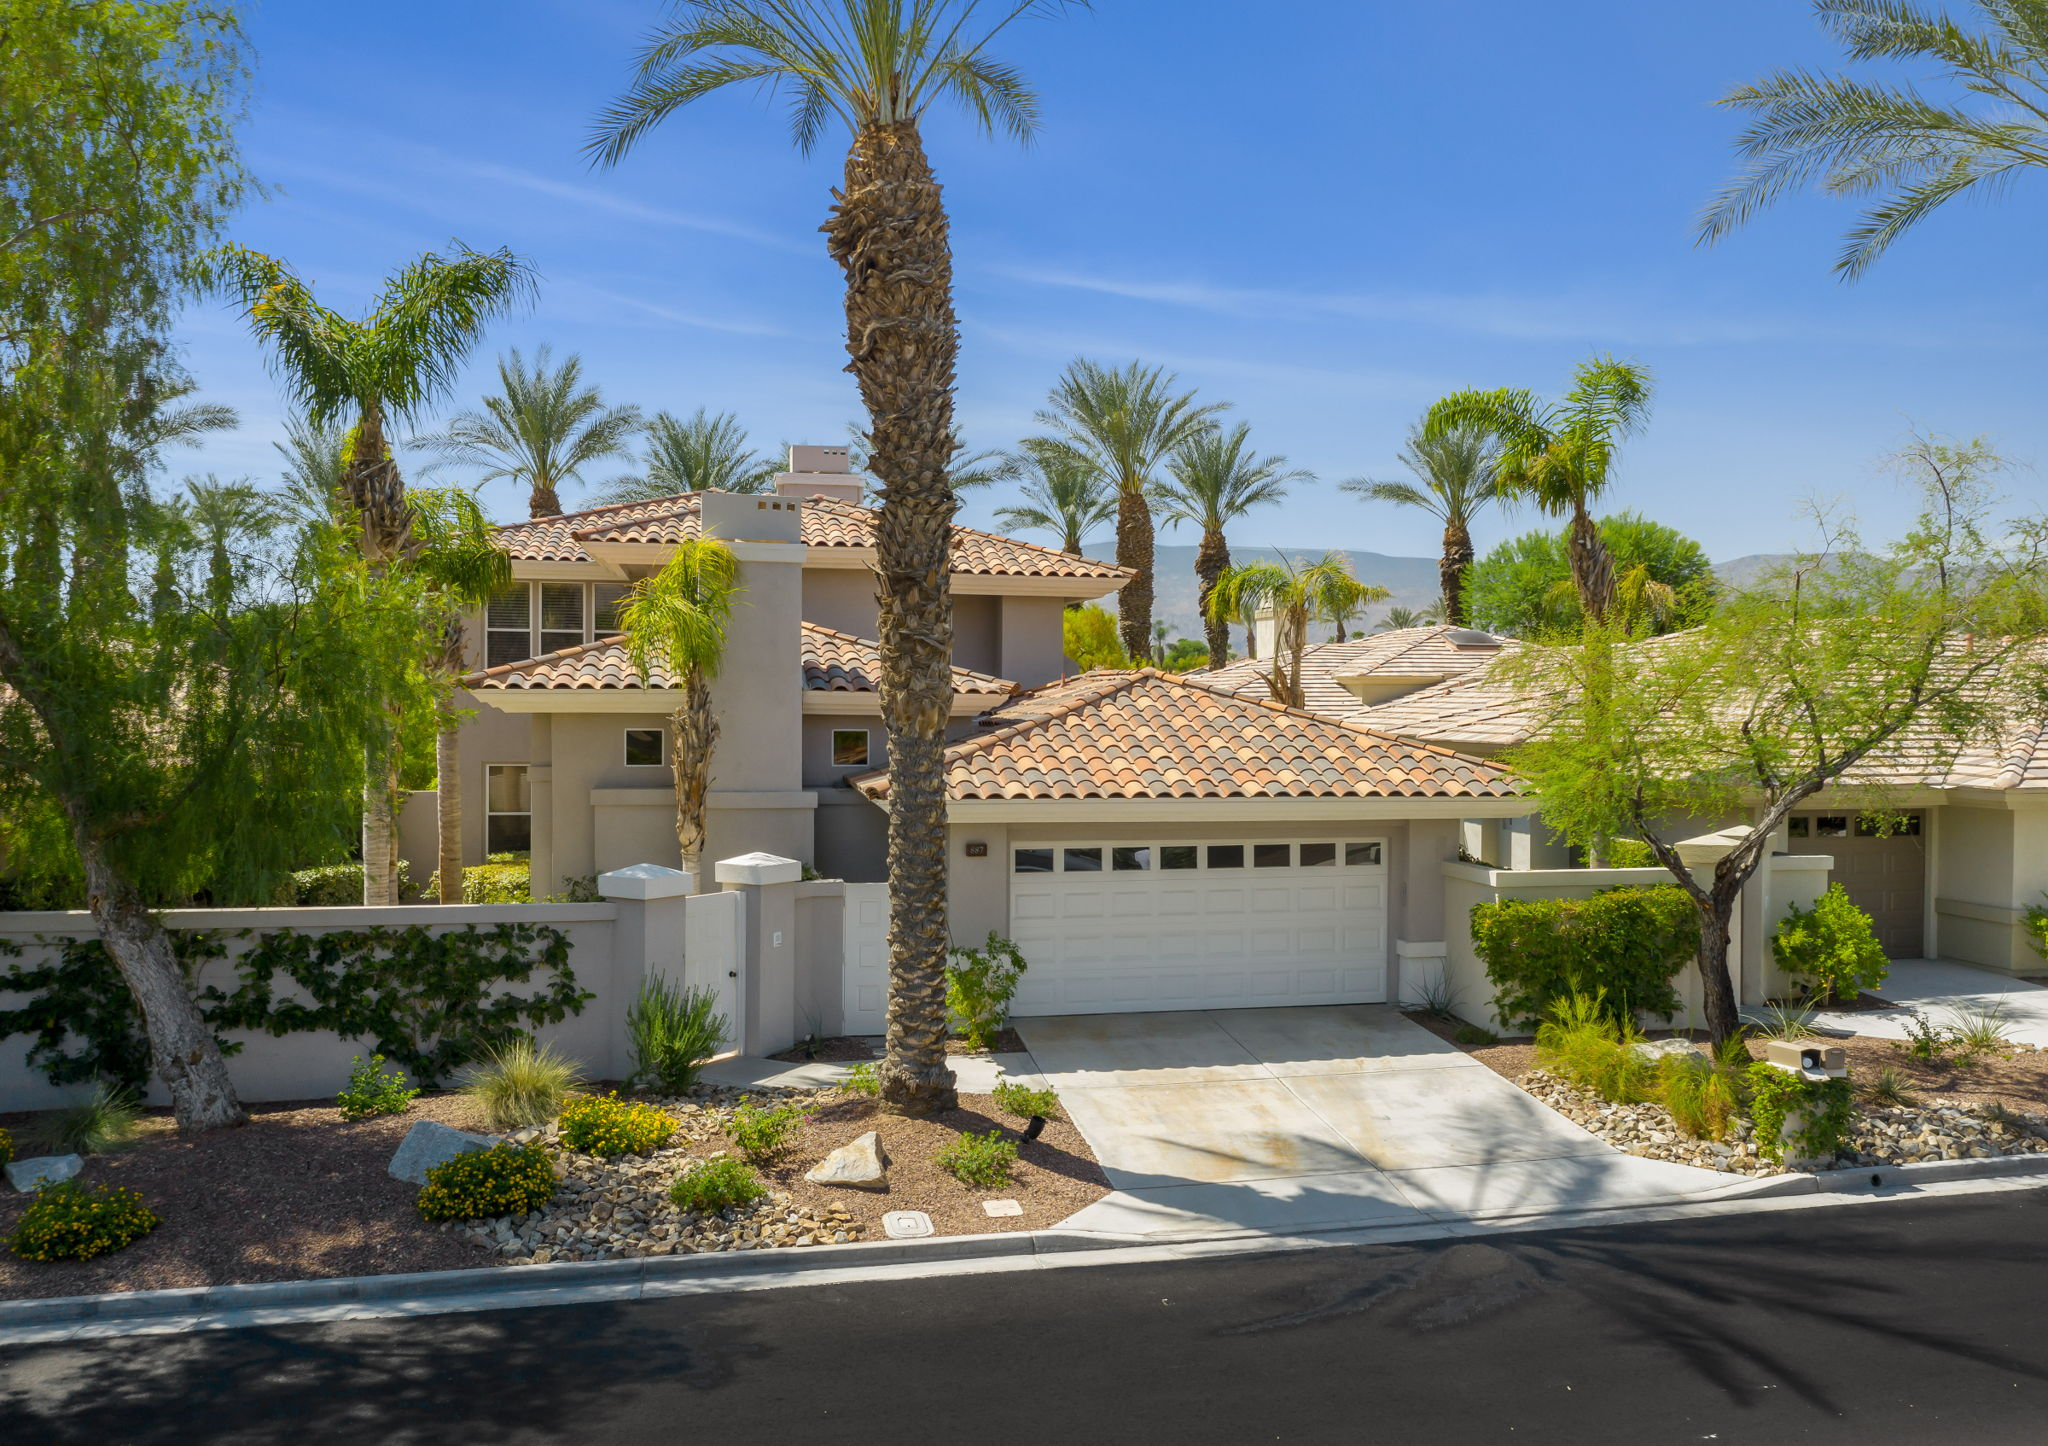 887 Red Arrow Trail, Palm Desert, CA 92211, US